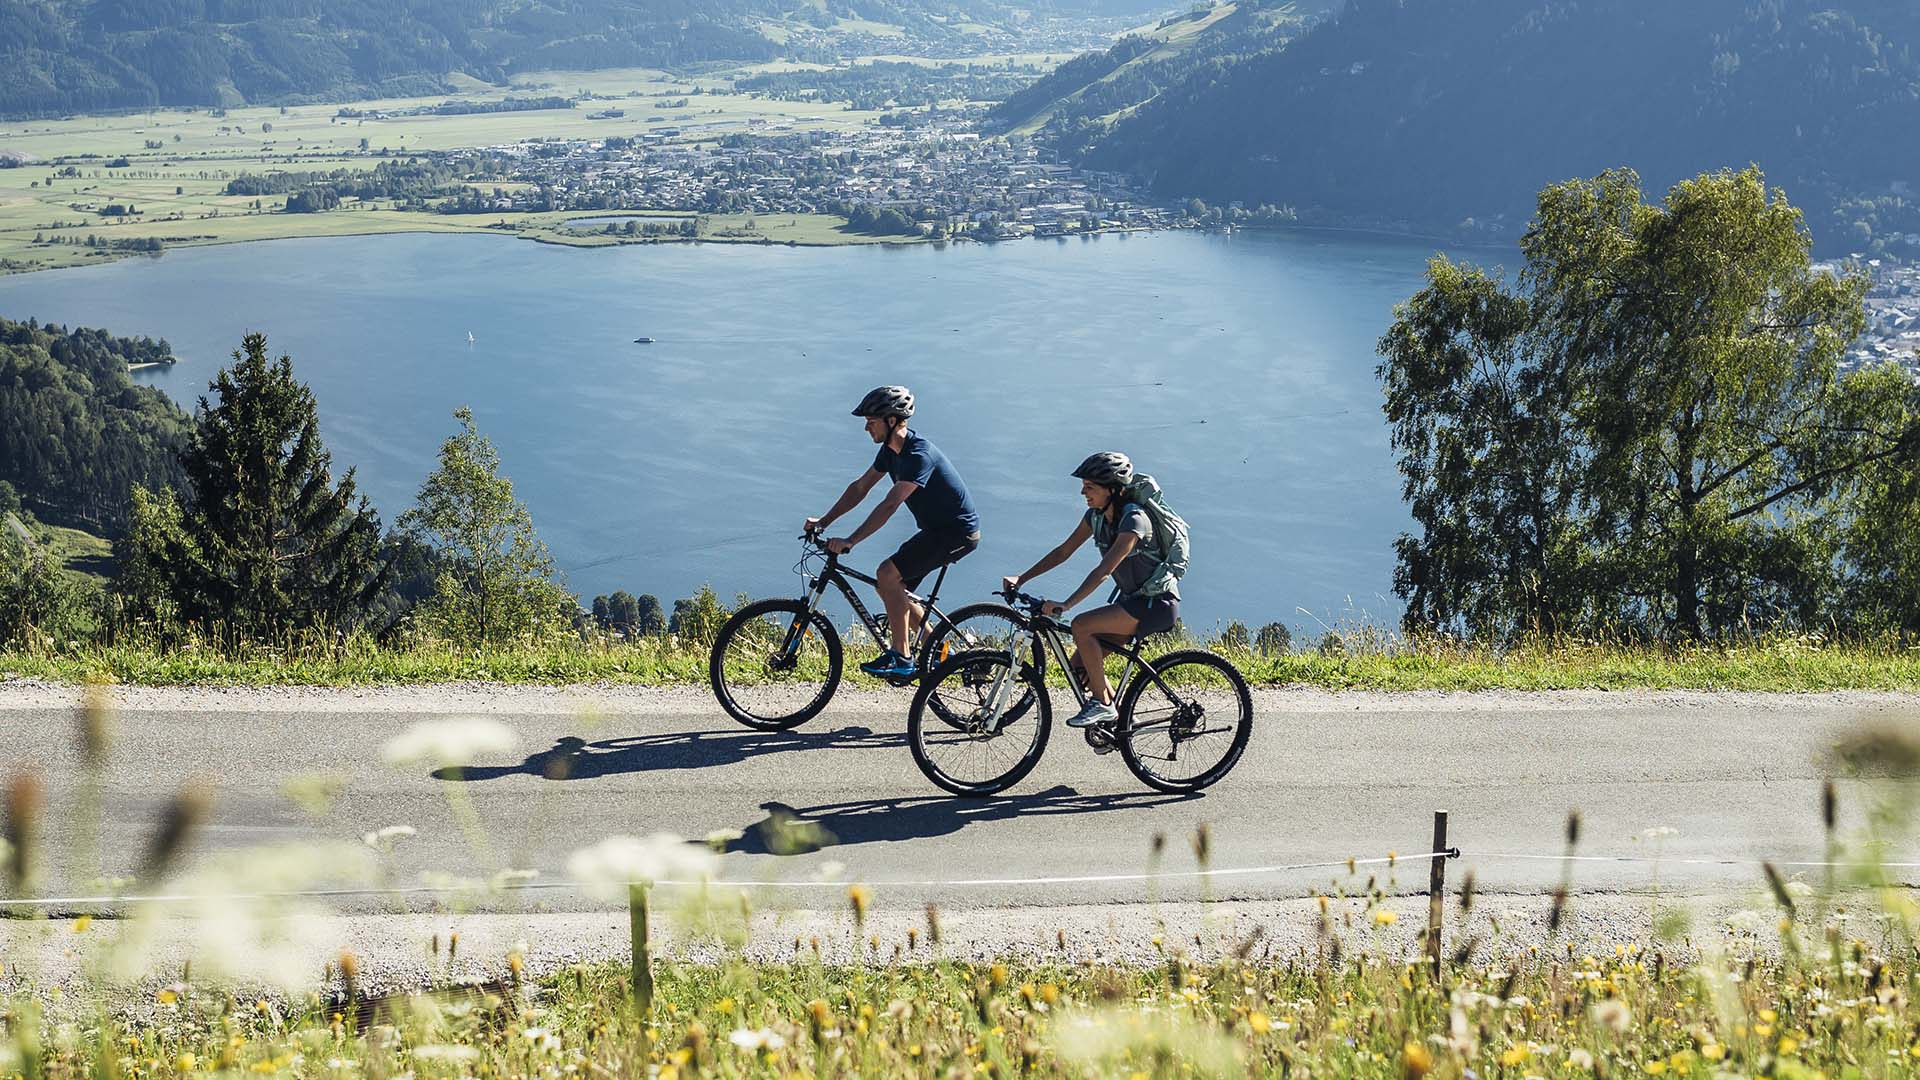 fahrradtour-auf-den-mitterberg-i---bike-ride-to-mitterberg-i-c-zell-am-see-kaprun-tourismus